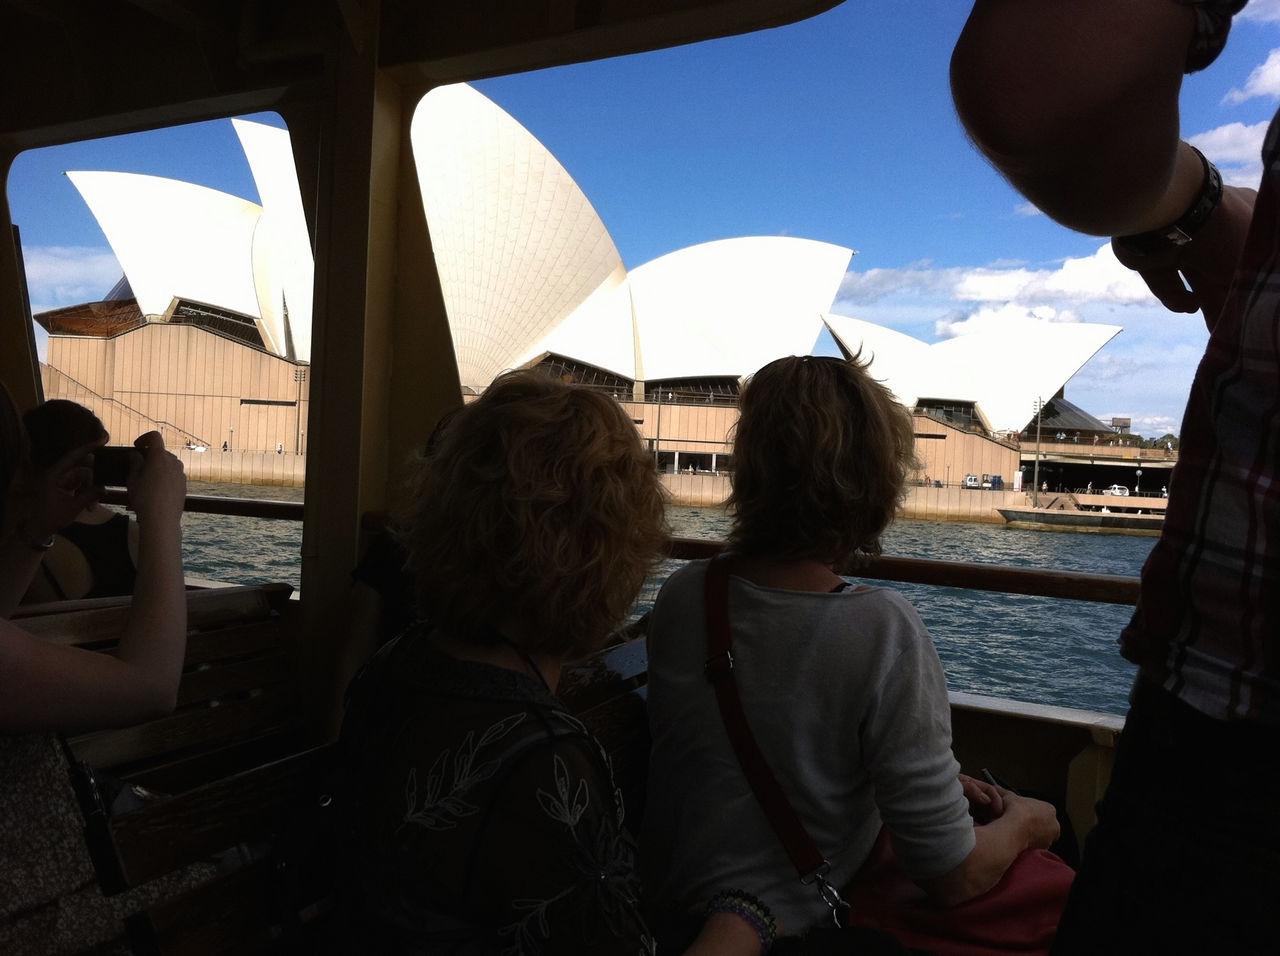 the house australia built